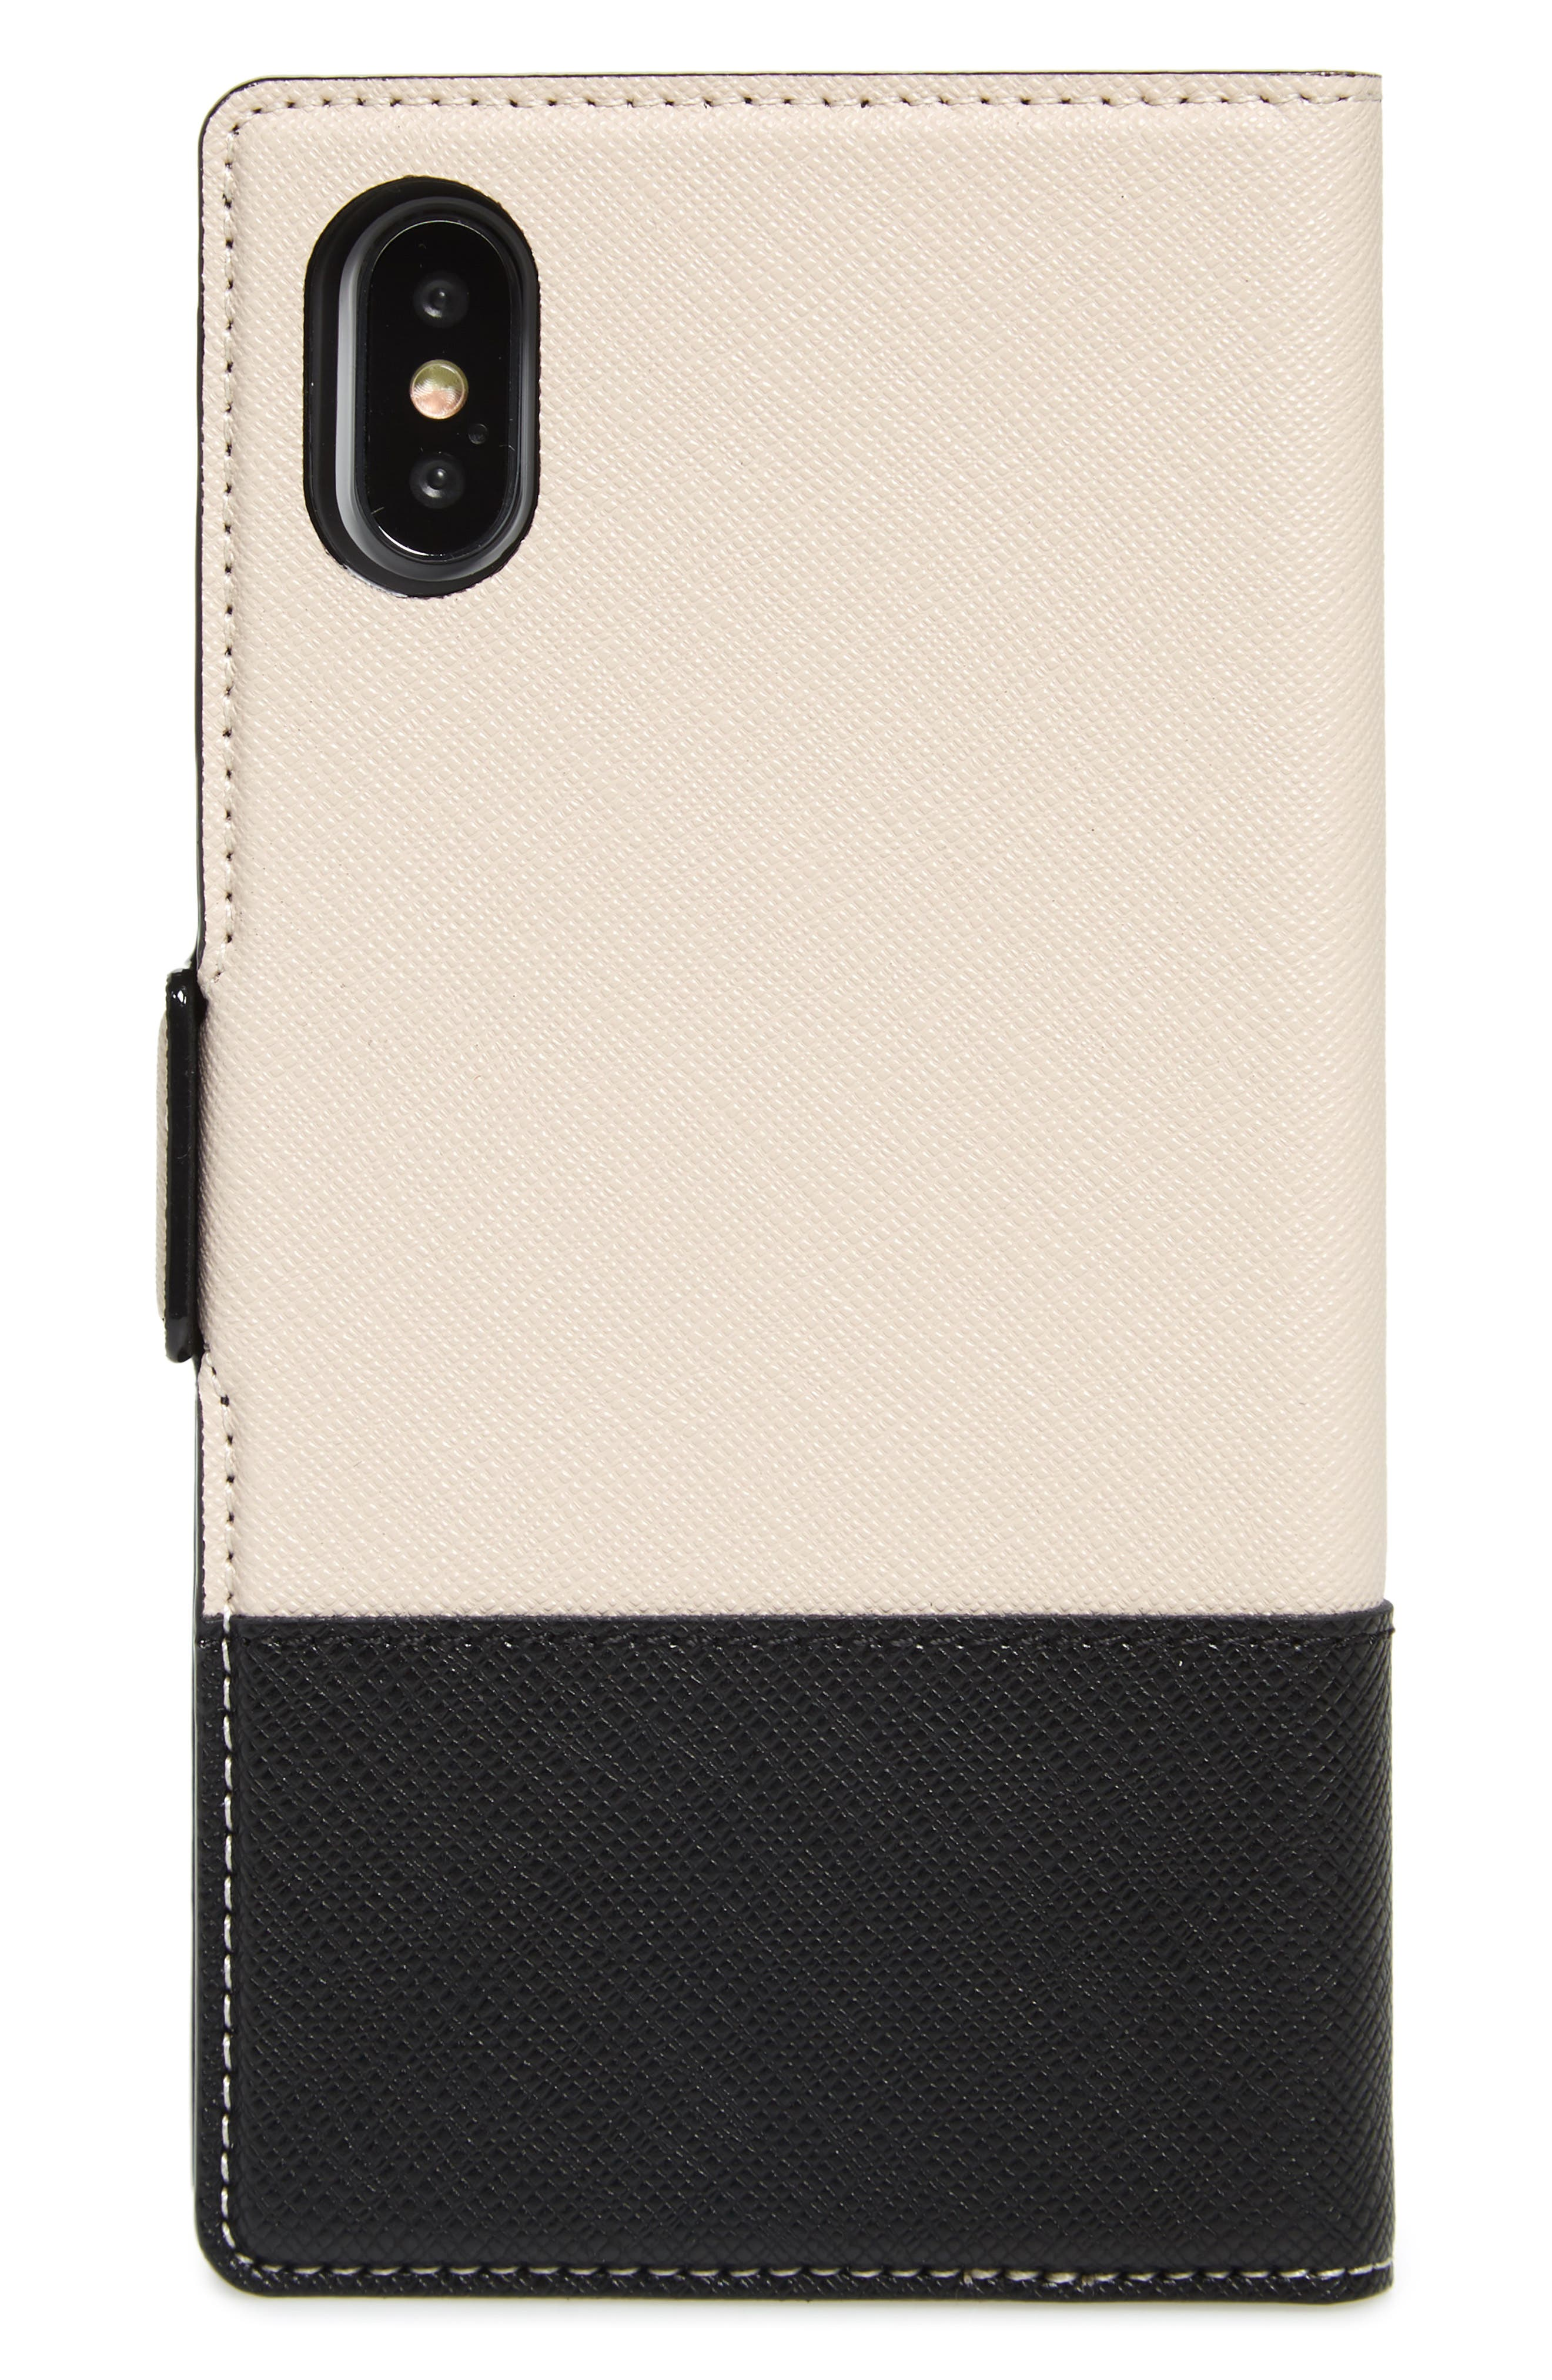 KATE SPADE NEW YORK,                             iPhone X/Xs/Xs Max & XR magnetic wrap folio case,                             Alternate thumbnail 3, color,                             BLACK/ TUSK